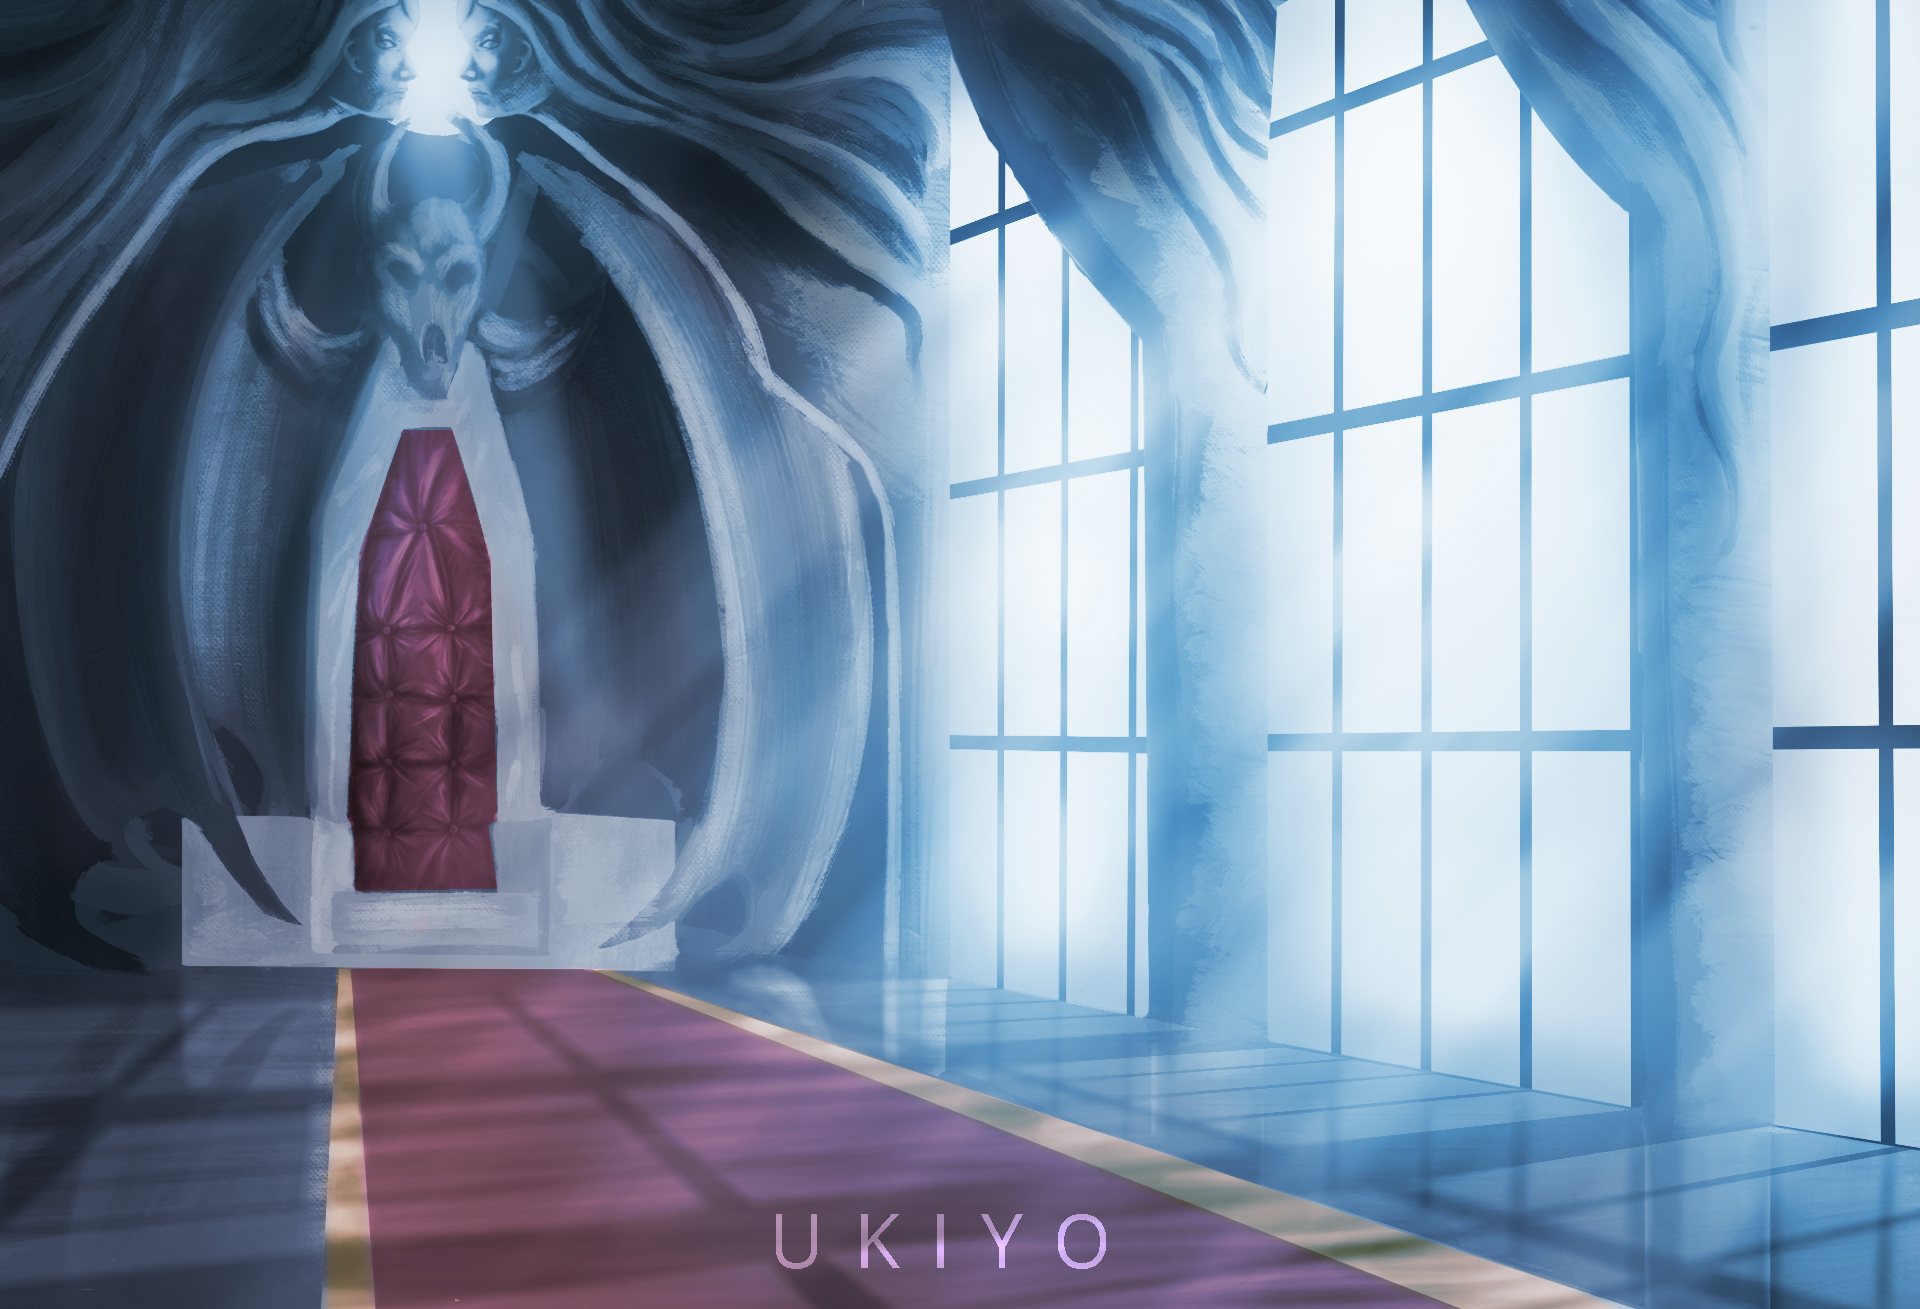 Throne Room by Ten-Tsuki